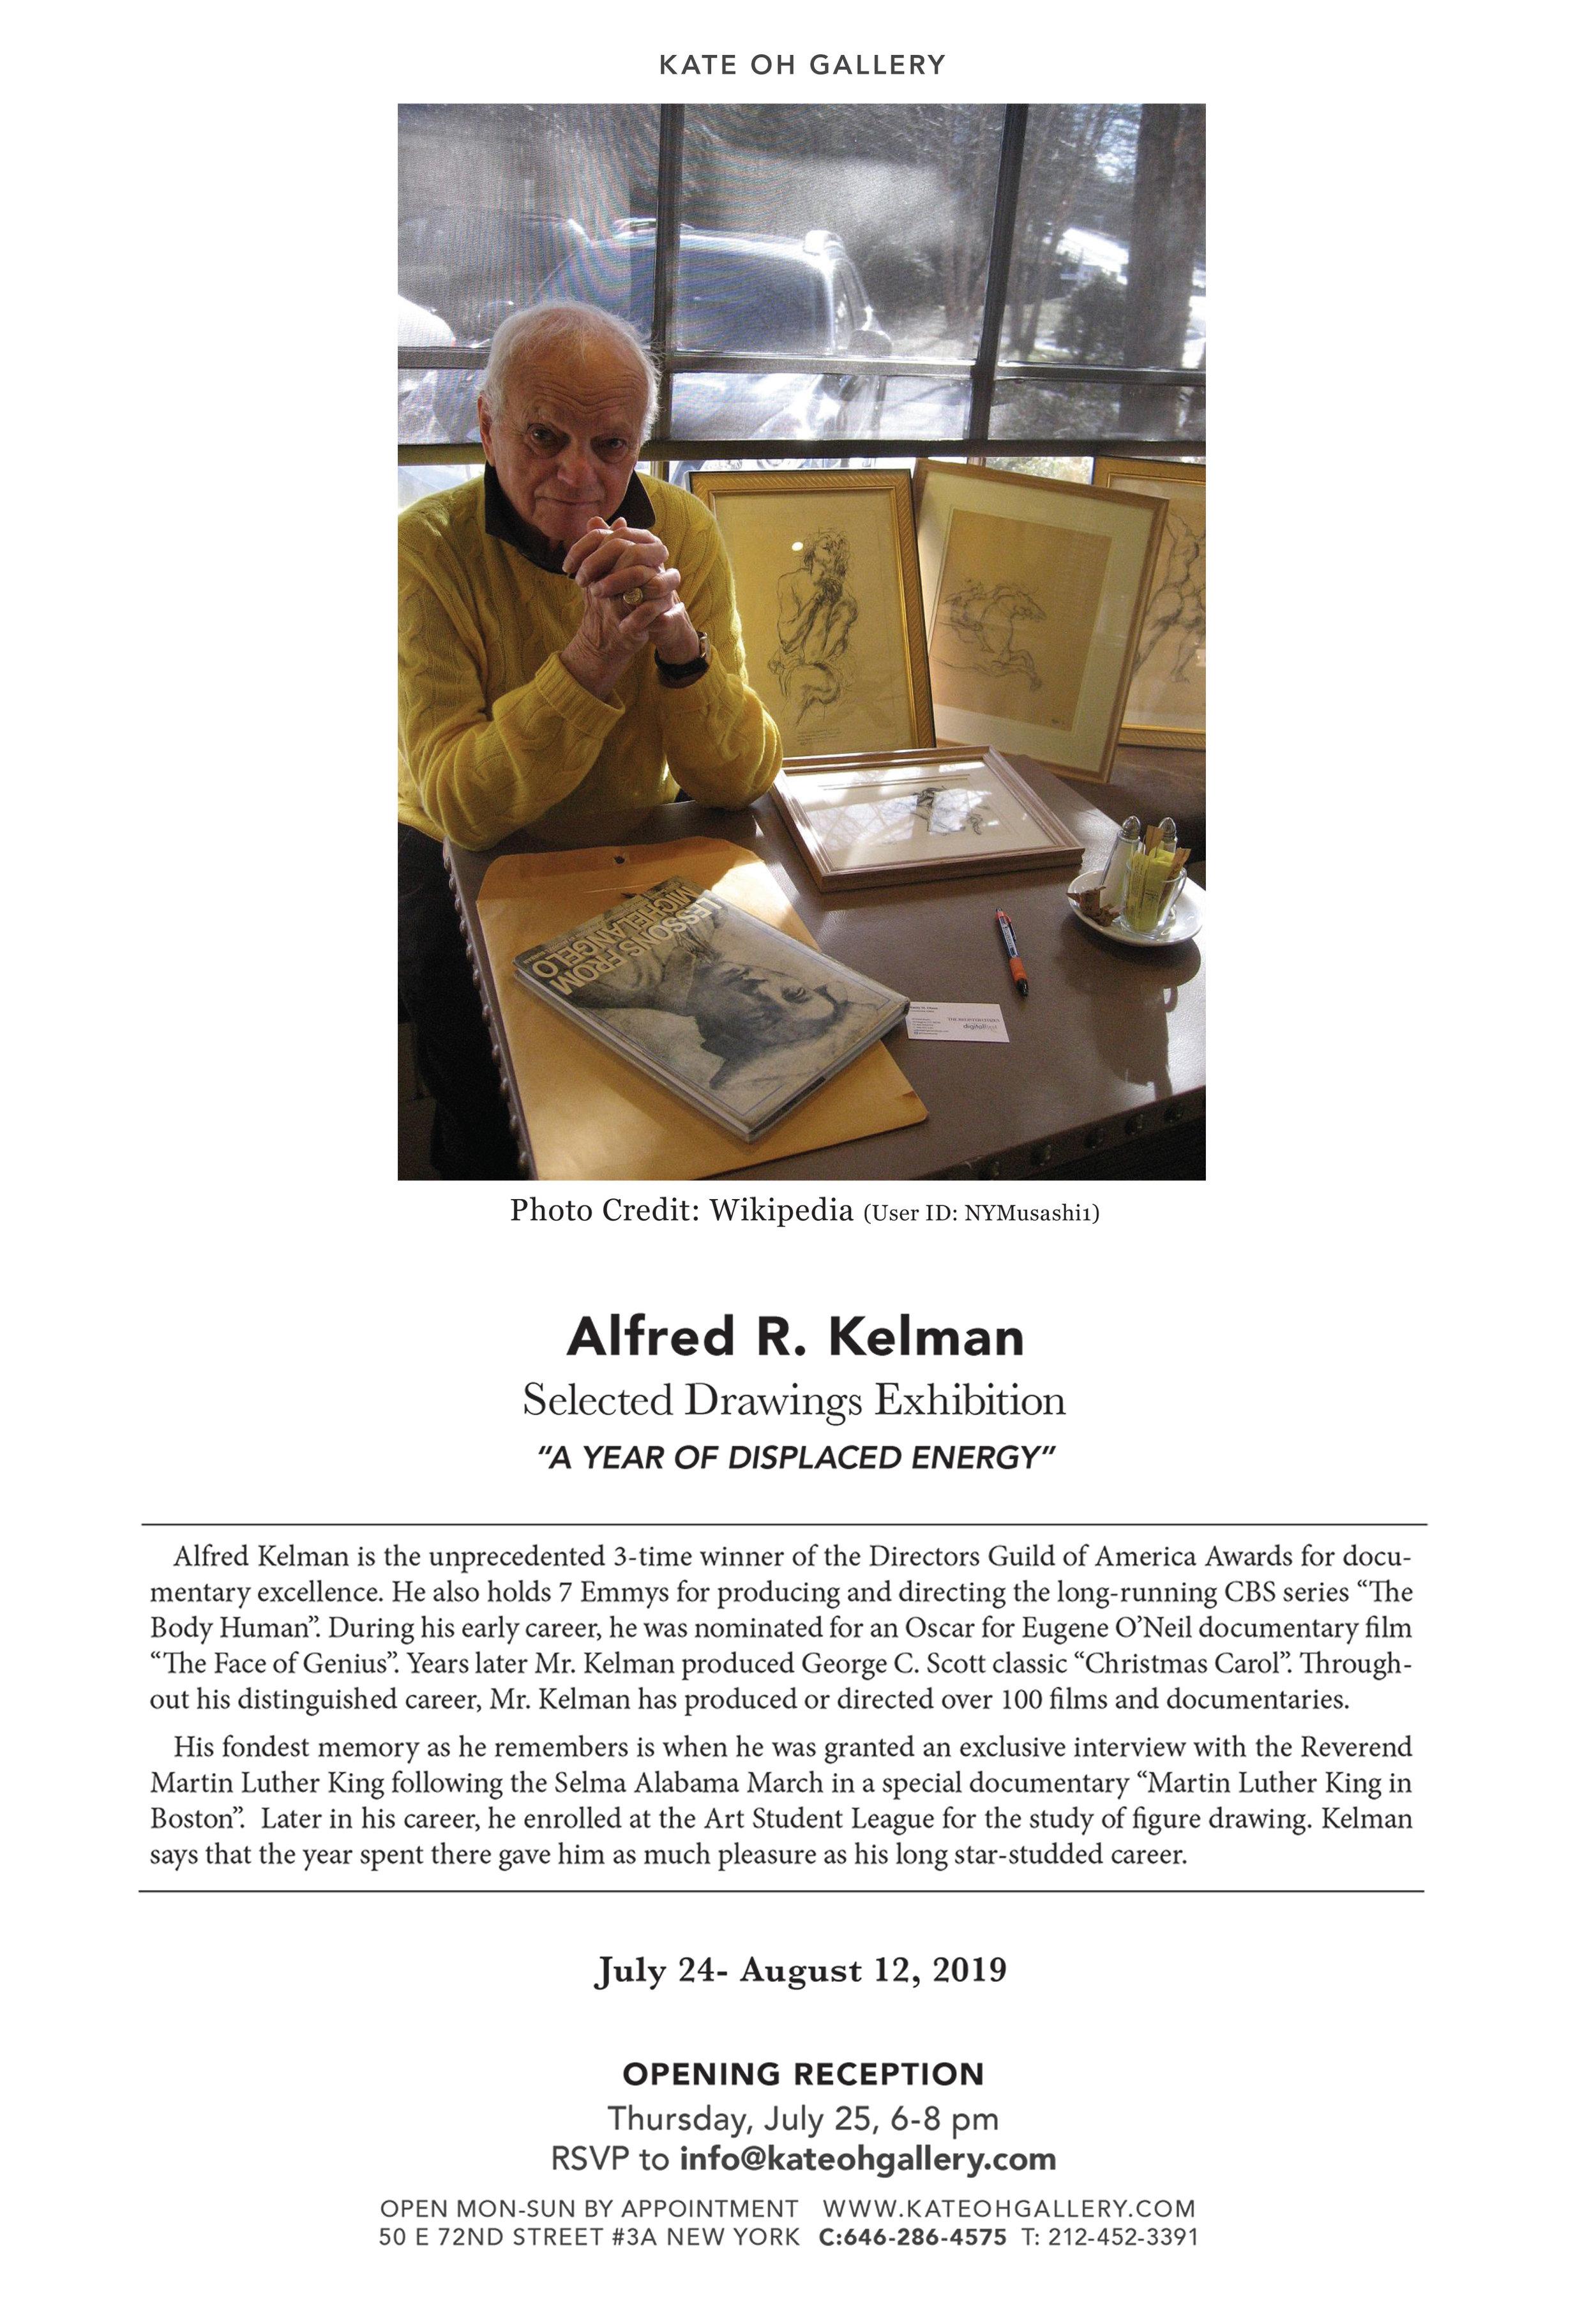 alfred-kelman poster.jpg